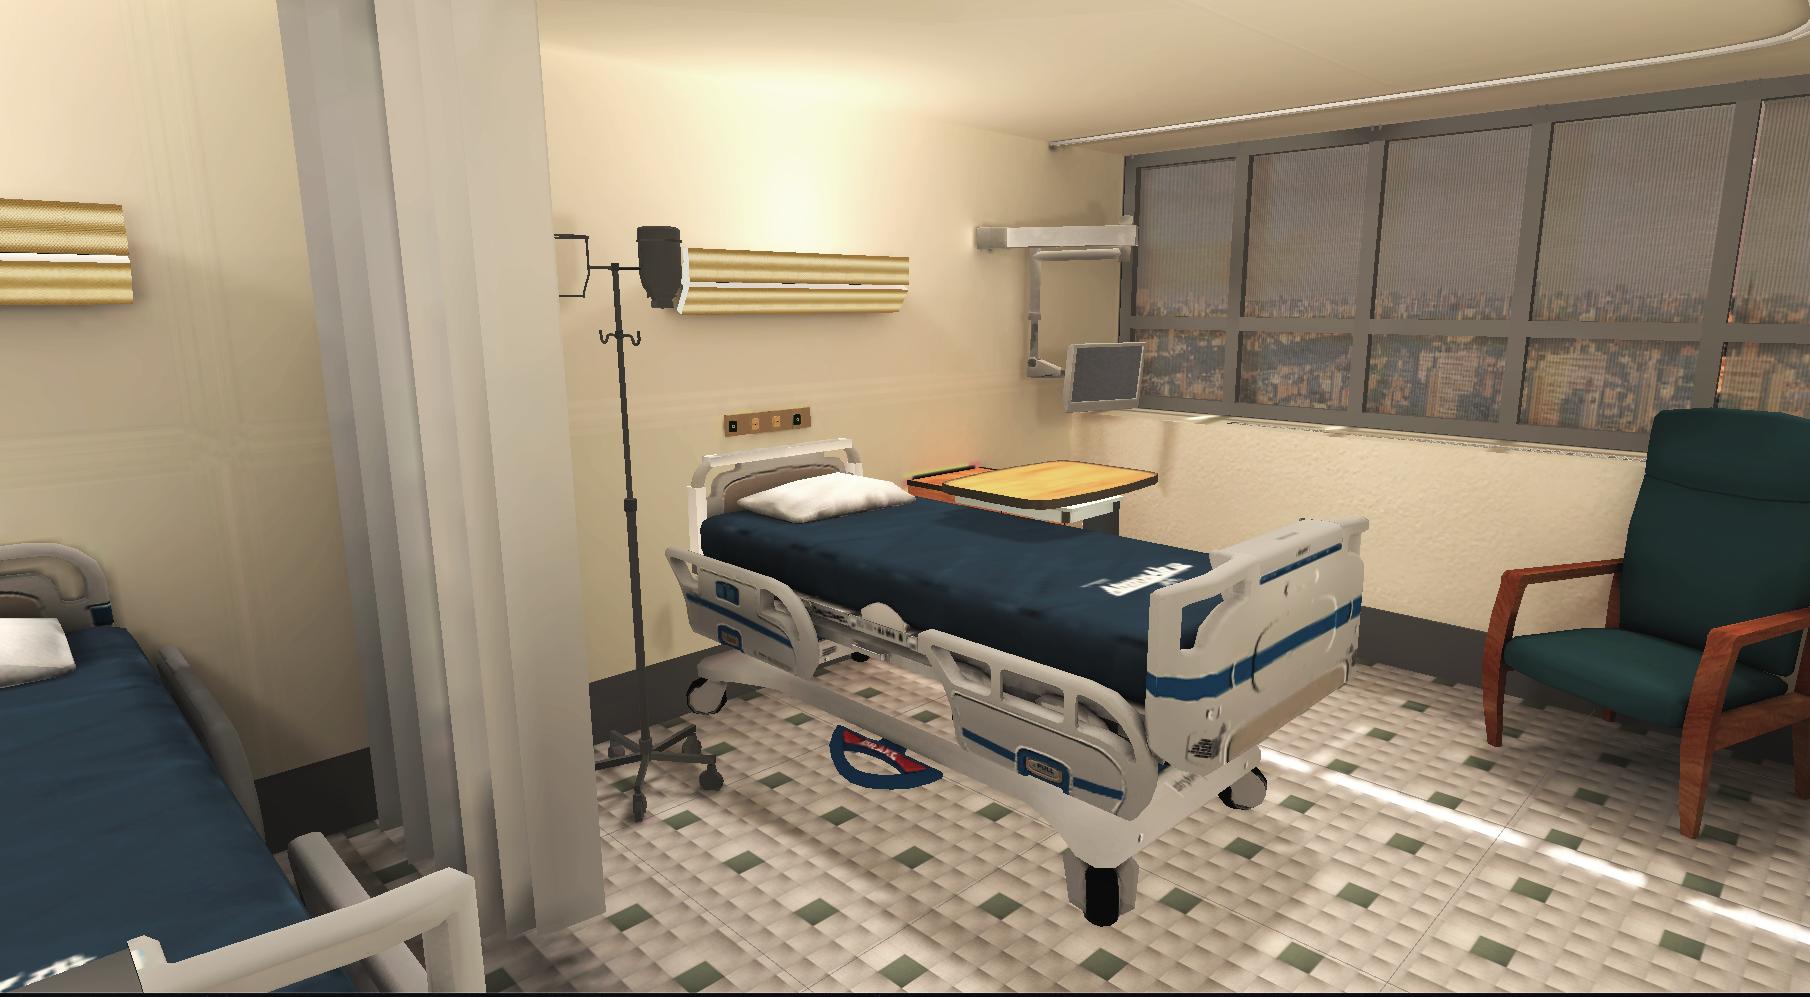 image of hospital room for VR simulation